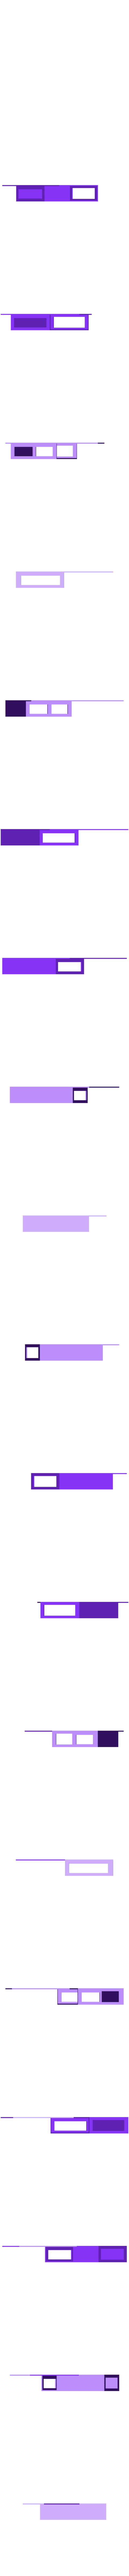 kevskyq200mm.stl Download STL file SKY Q MINI BEHIND TV HANGING MOUNT VESA COMPATIBLE • 3D printer template, beanieboy182